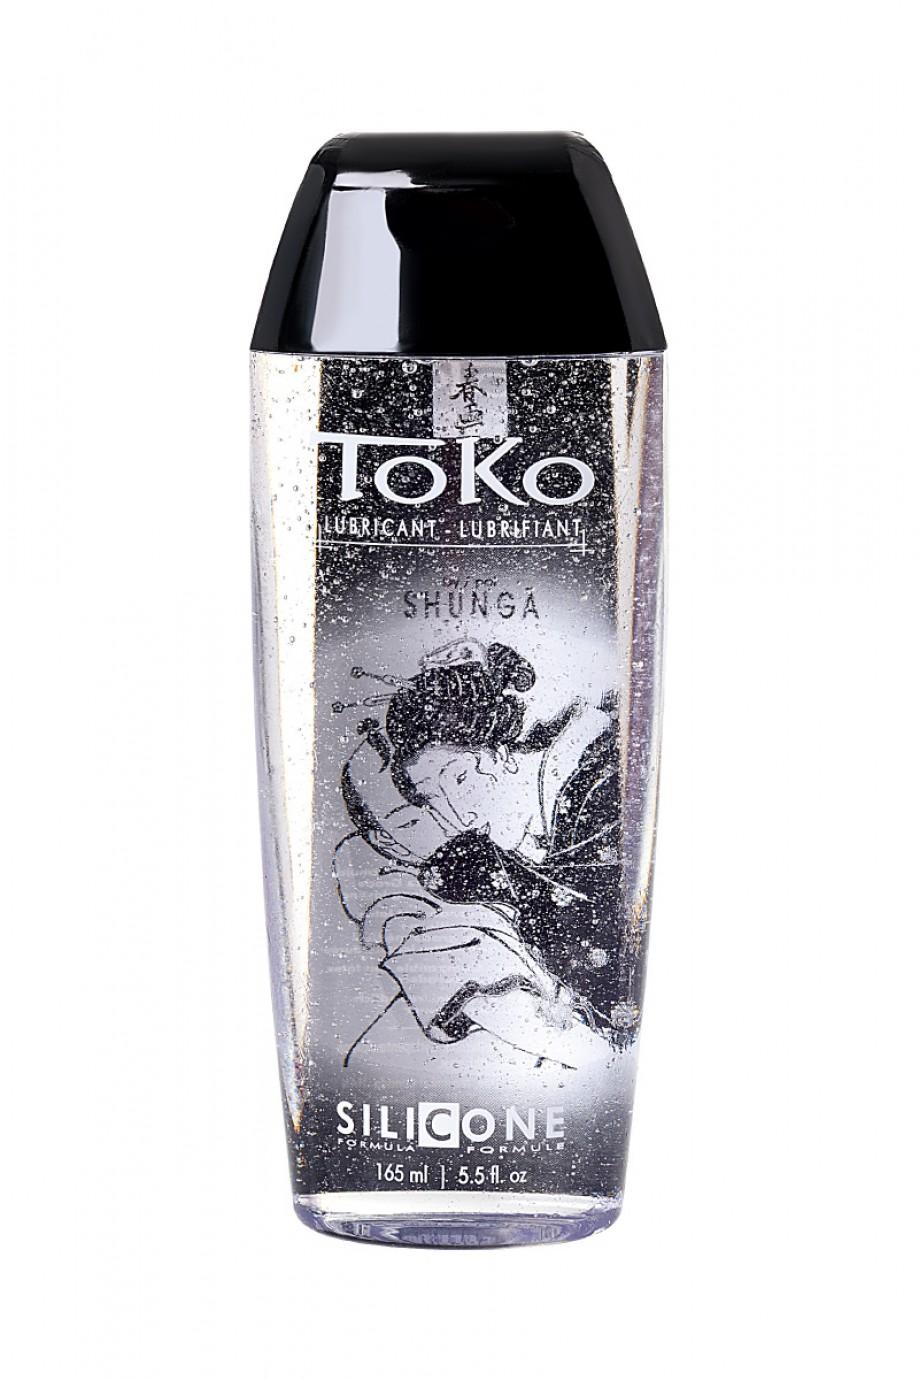 Лубрикант Shunga Toko Silicone, 165 мл